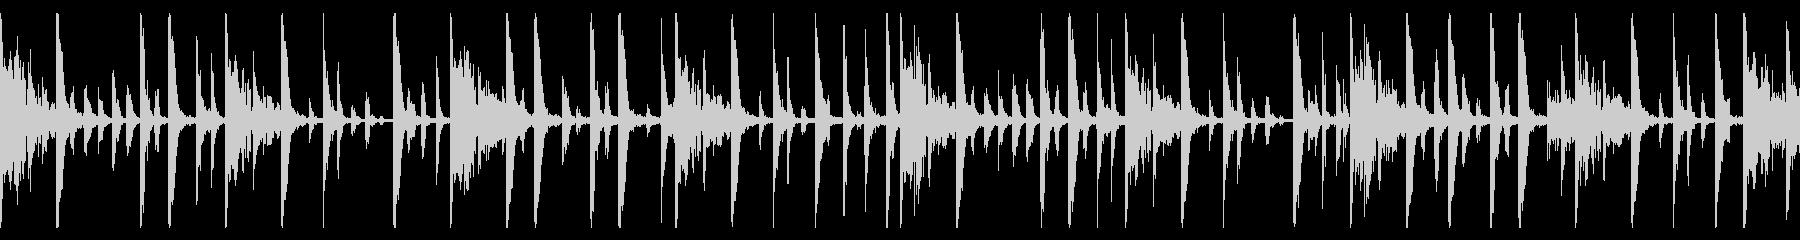 115 BPMの未再生の波形